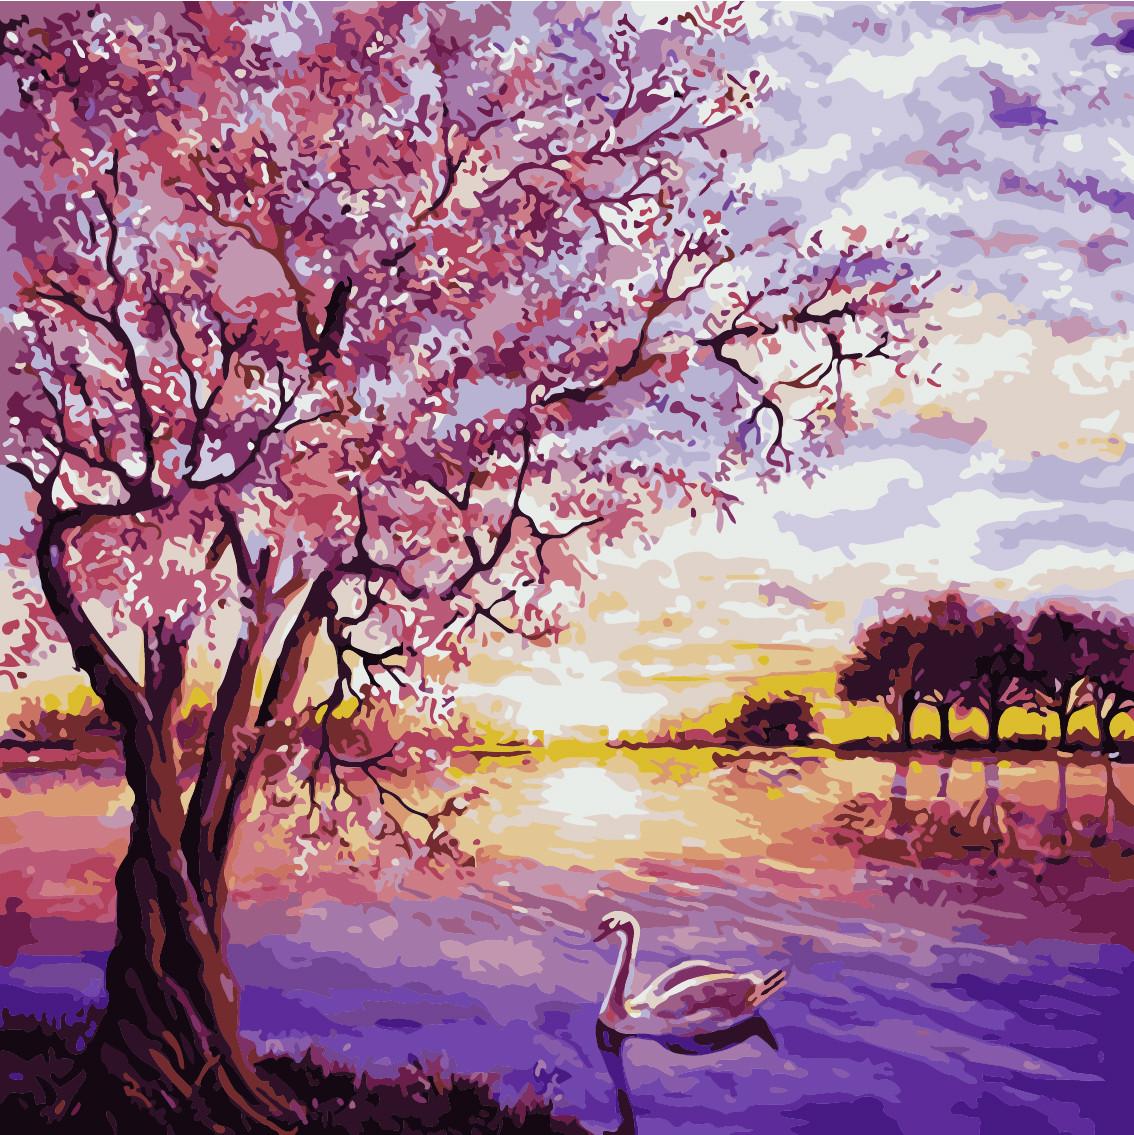 Набор для рисования Закат в розовых тонах ArtStory AS0228 40 х 40 см (без коробки)